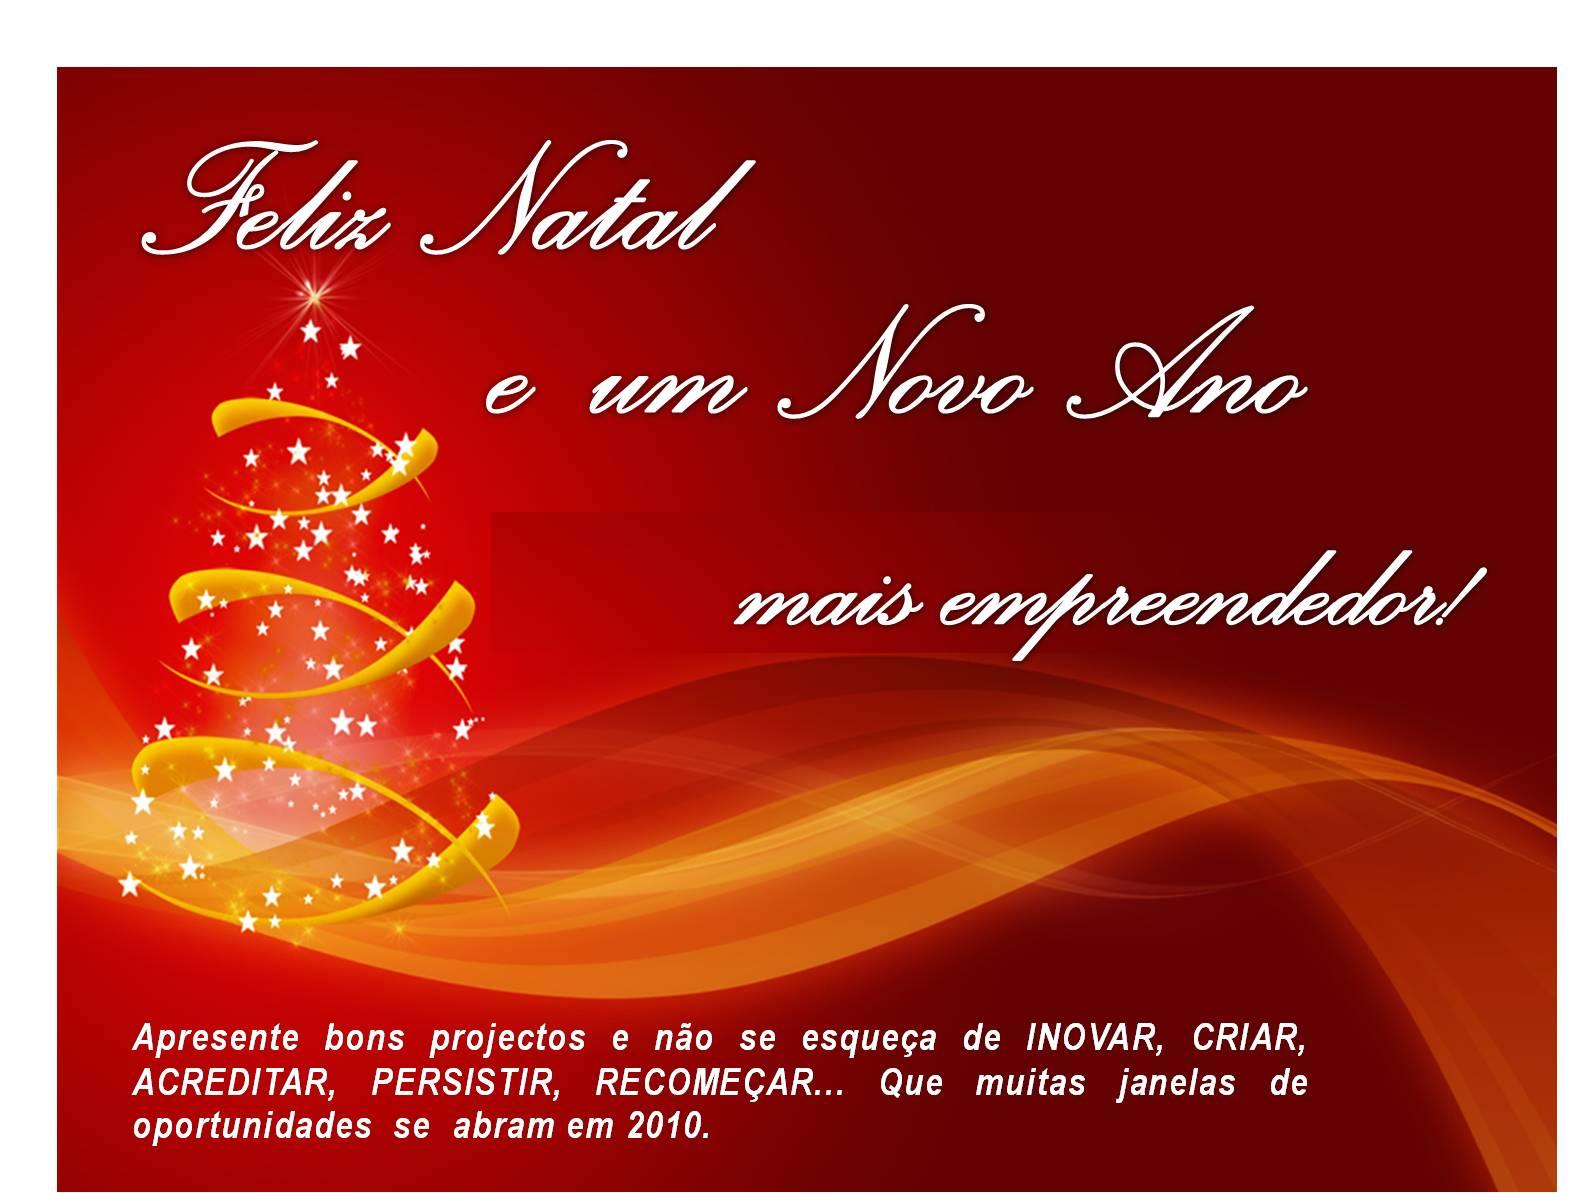 Frases De Boas Festas Para Clientes: Boas Festas Para Todos Feliz 2013 :Piadas Para Facebook